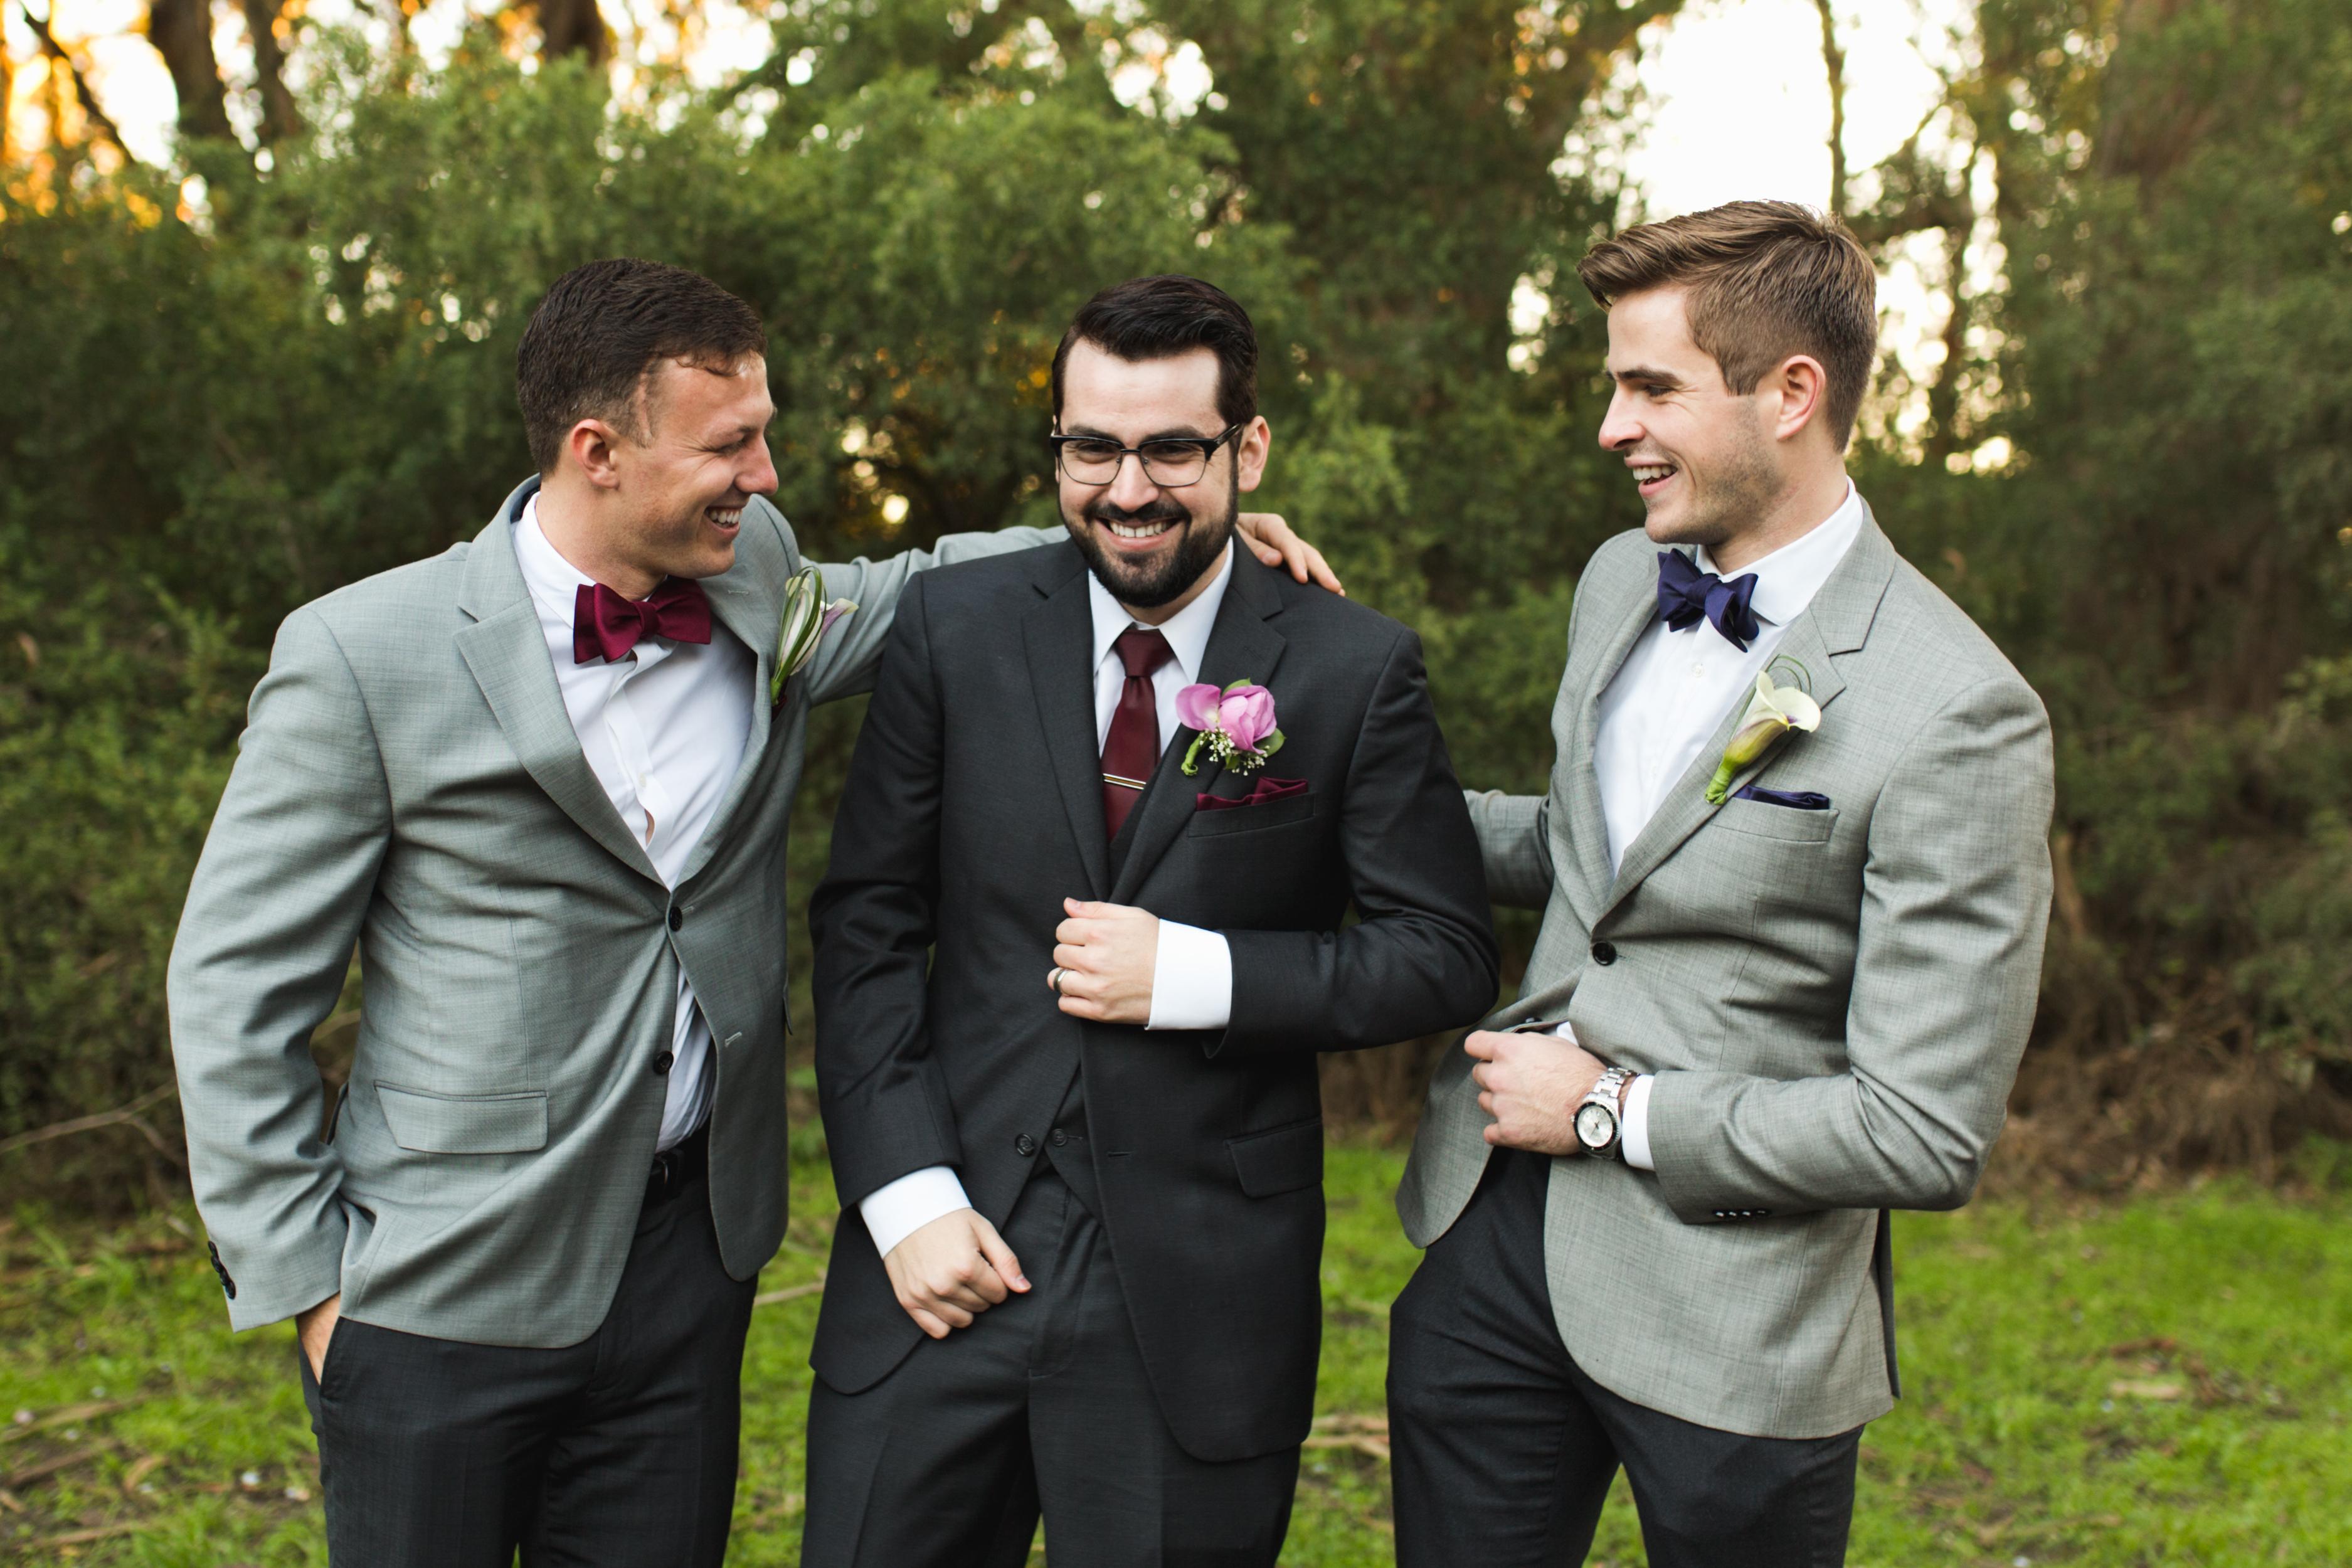 golden-gate-park-san-francisco-wedding-groomsmen